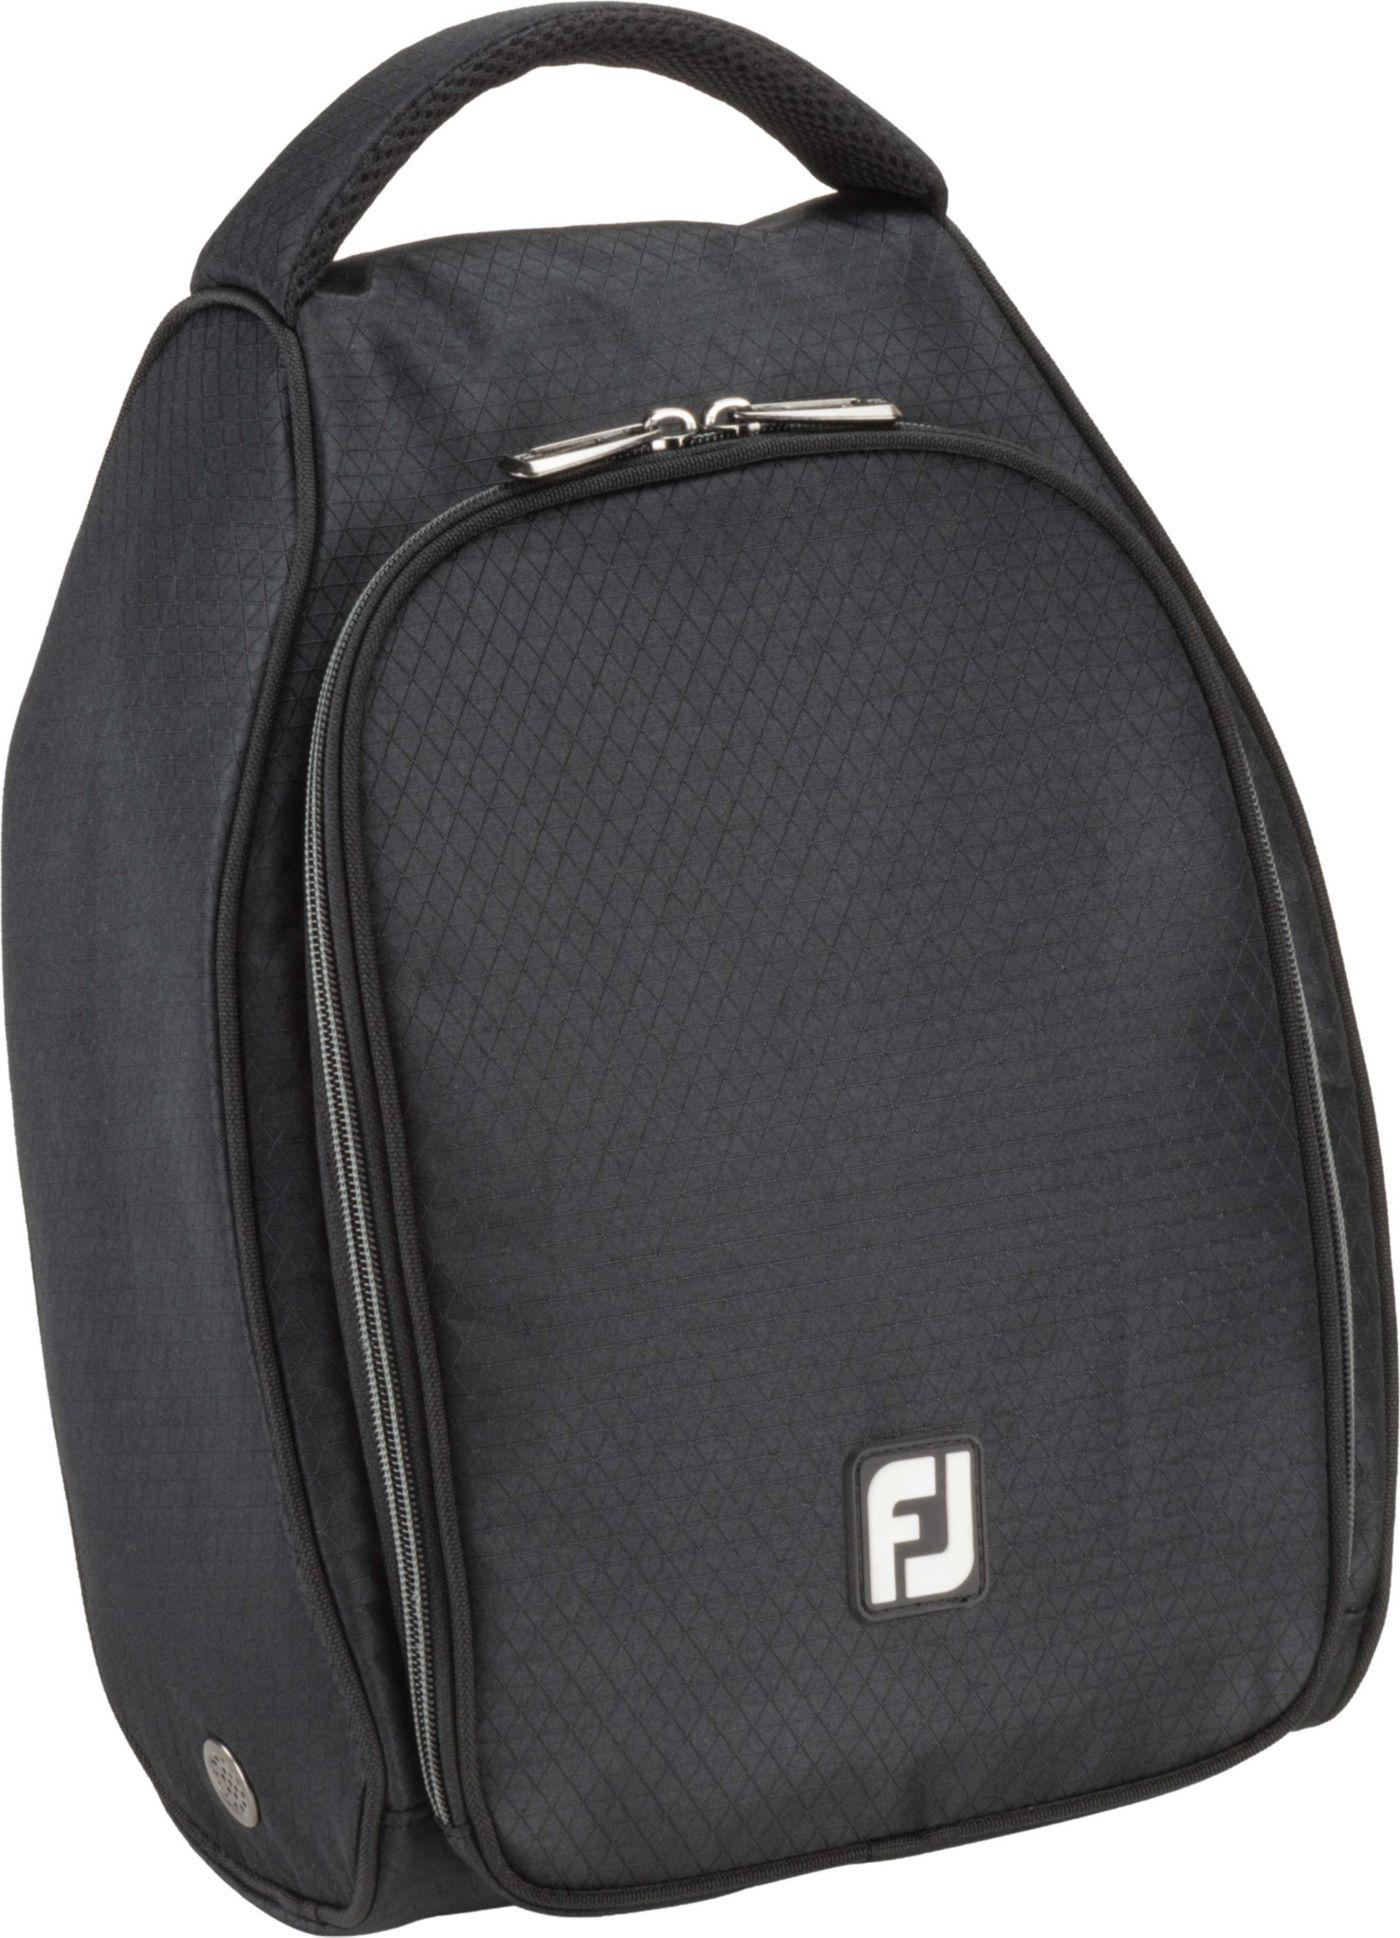 FootJoy Golf Shoe Bag